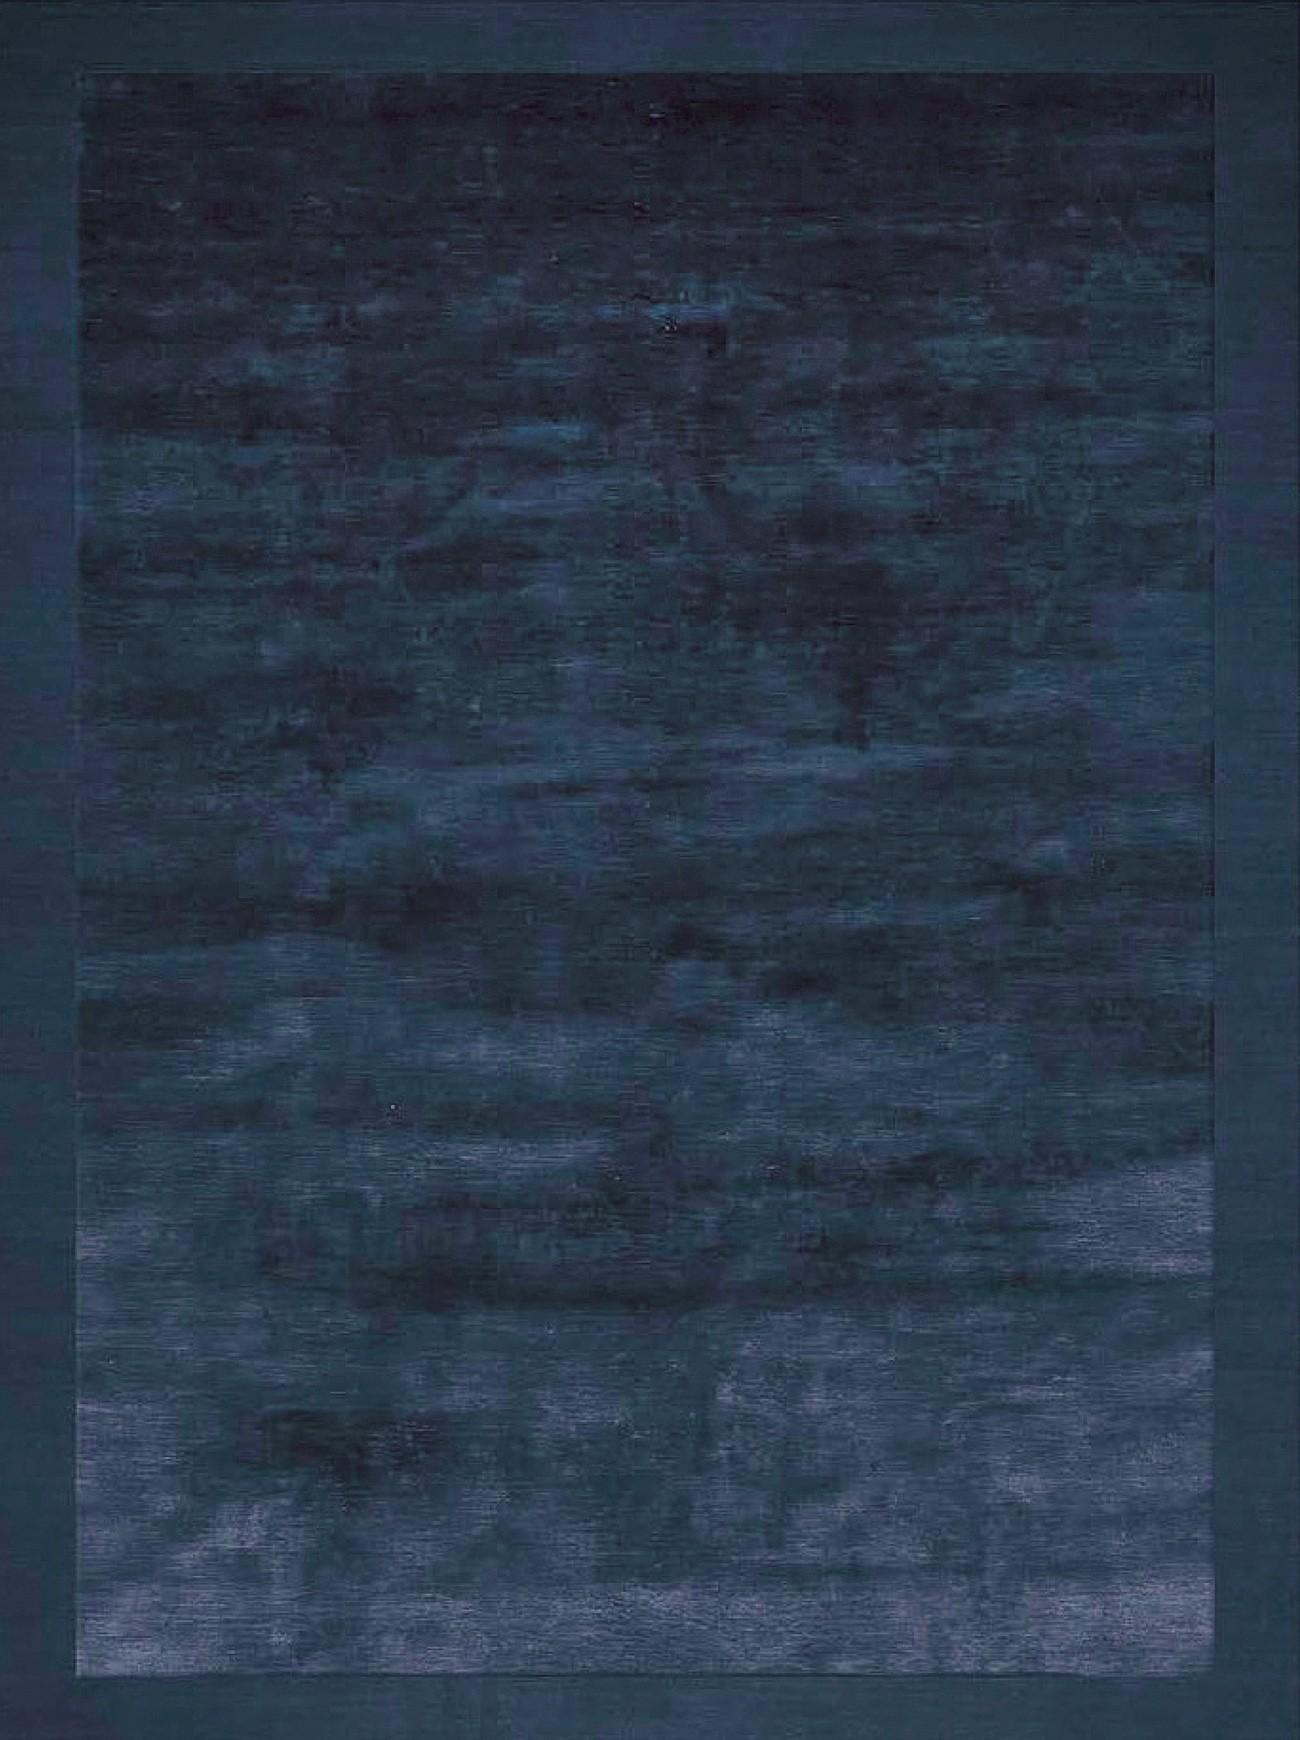 Poliform_tappeti_FRAME_05_finiture_1300x1740px_Oceano